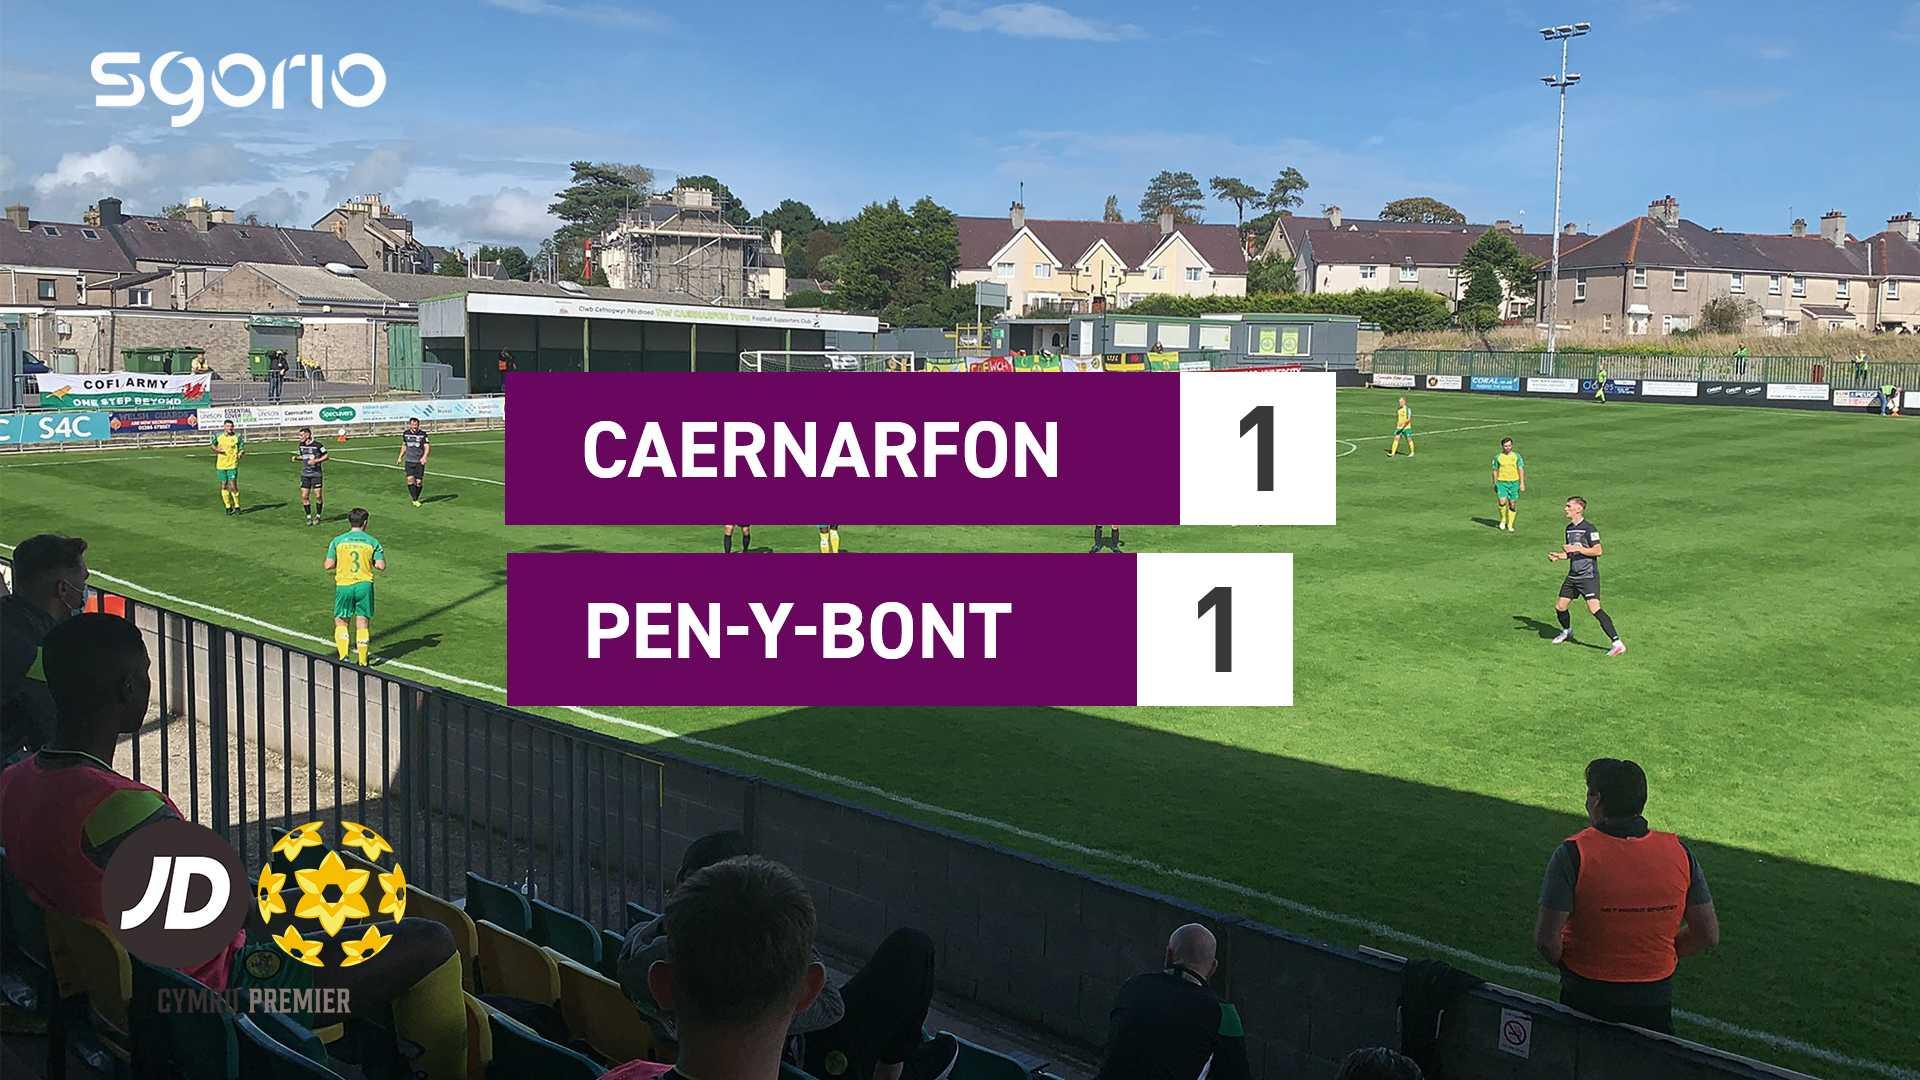 Caernarfon 1–1 Pen-y-bont